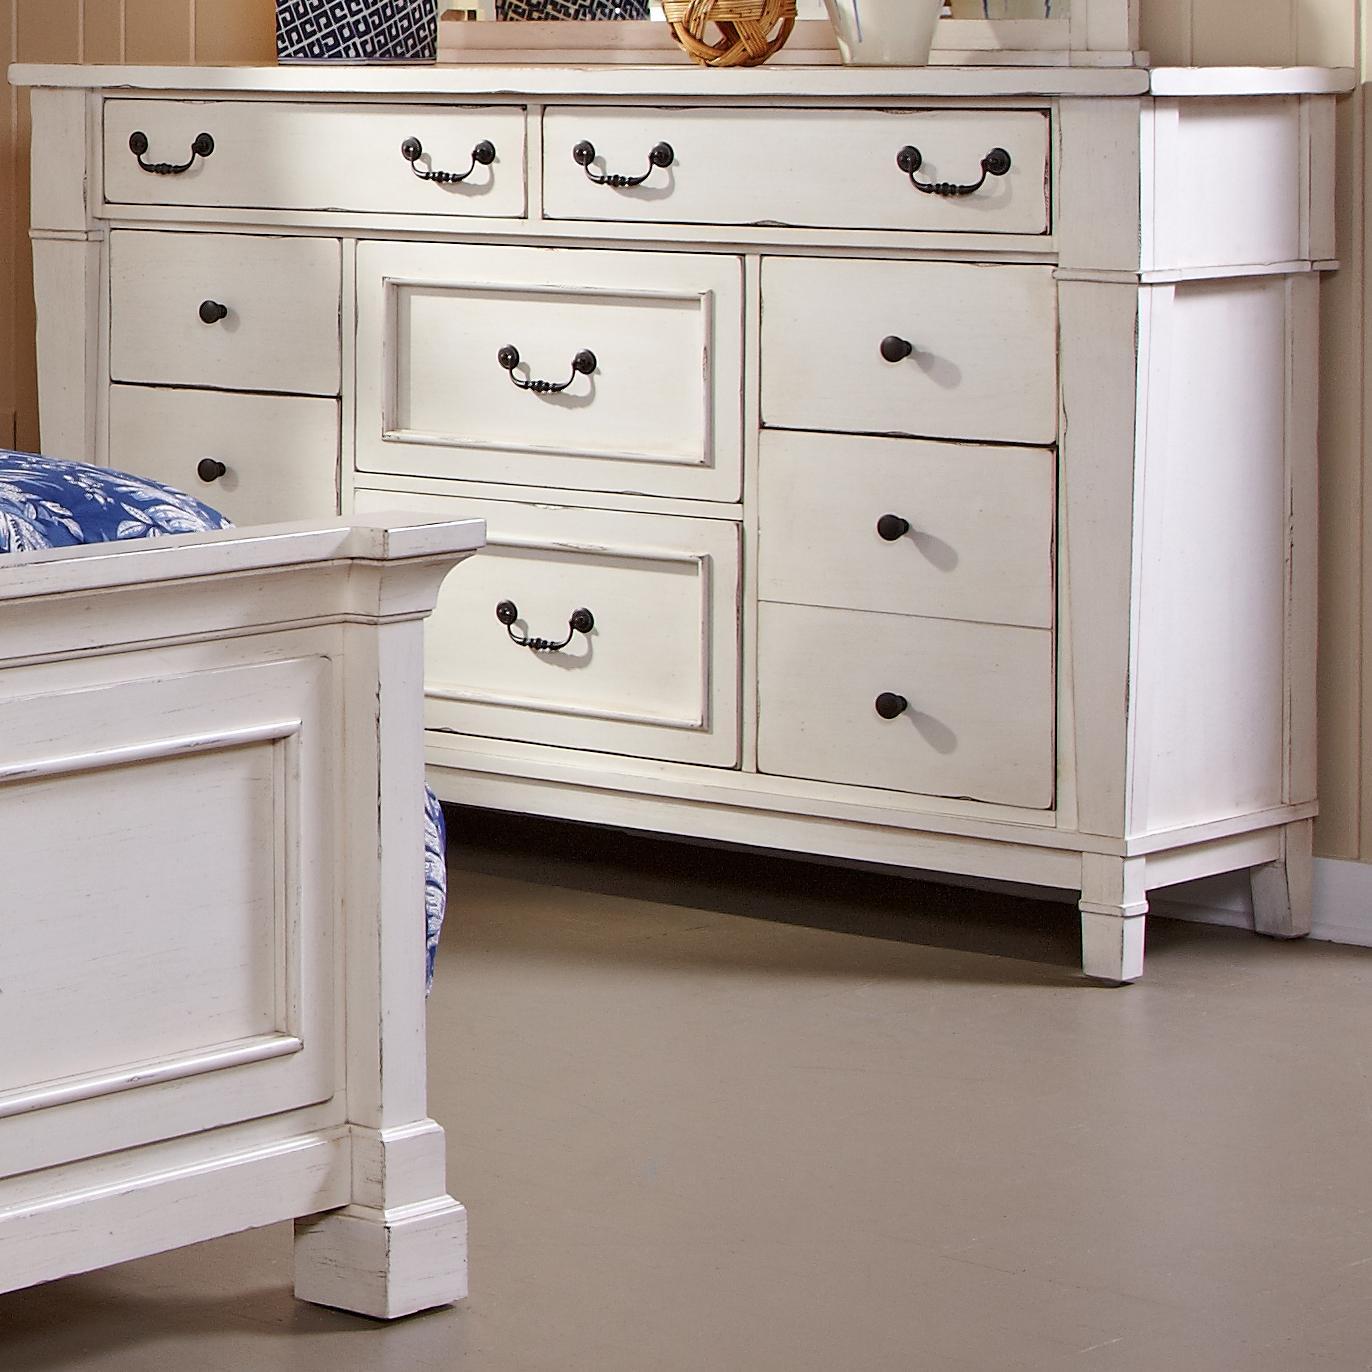 Astoria Eight Drawer Dresser at Walker's Furniture